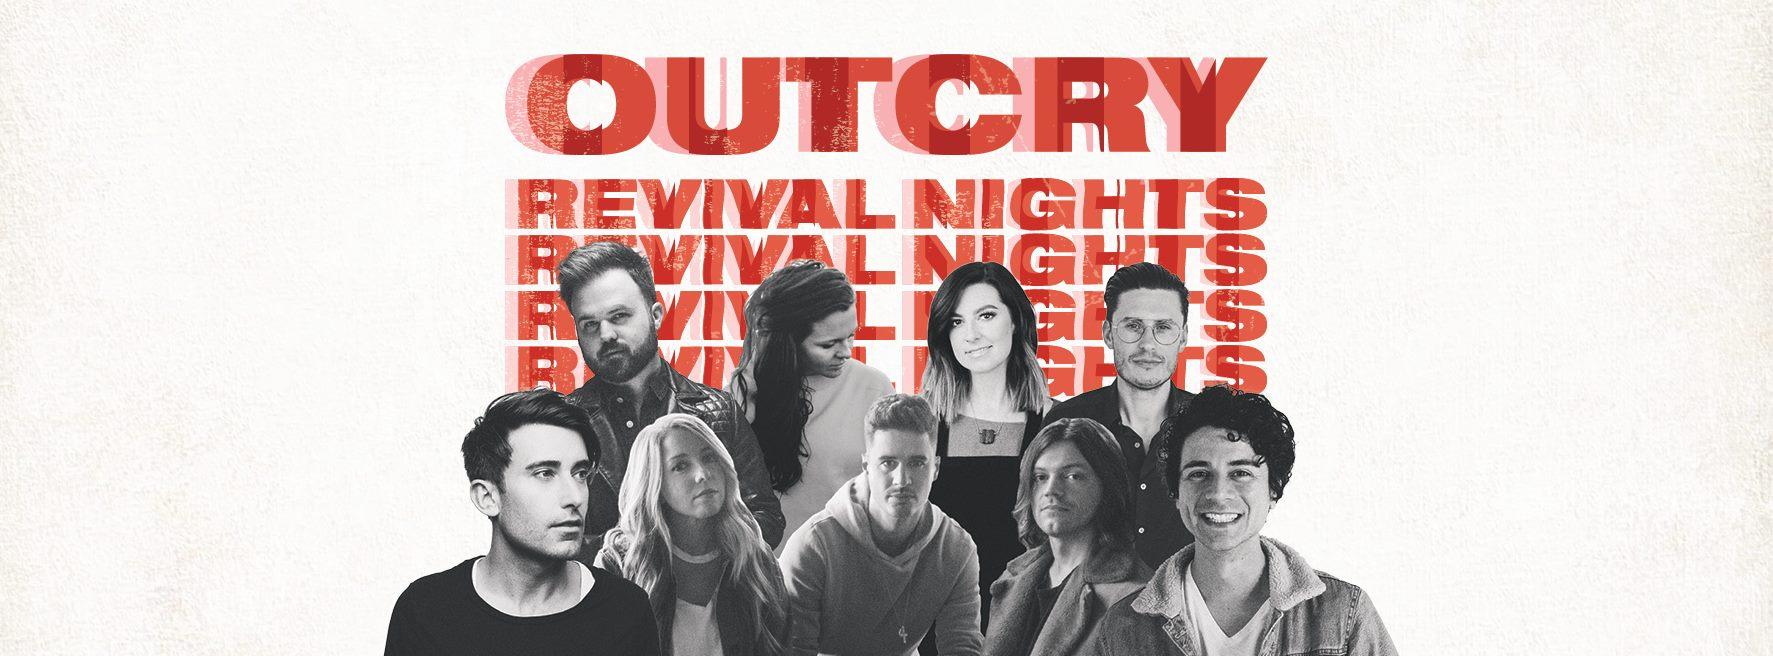 OUTCRY Revival Nights Tour 2019